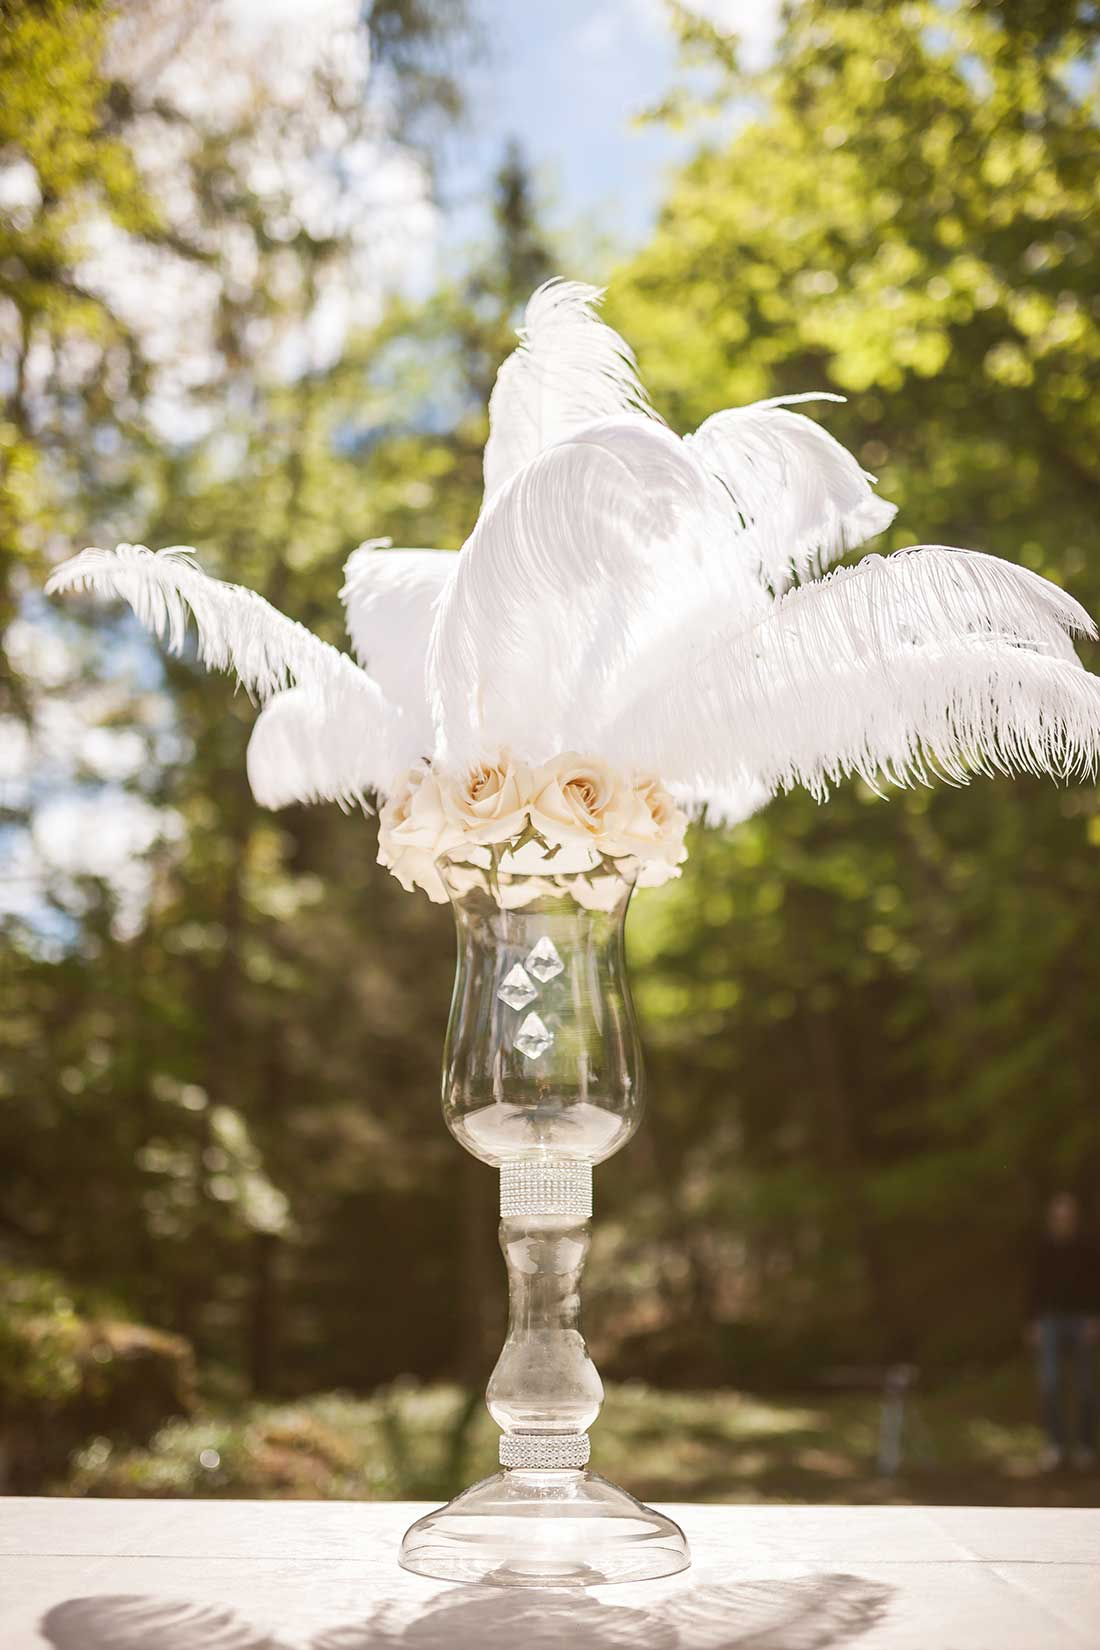 IL-23-main-feather-decoration-wedding-ceremon